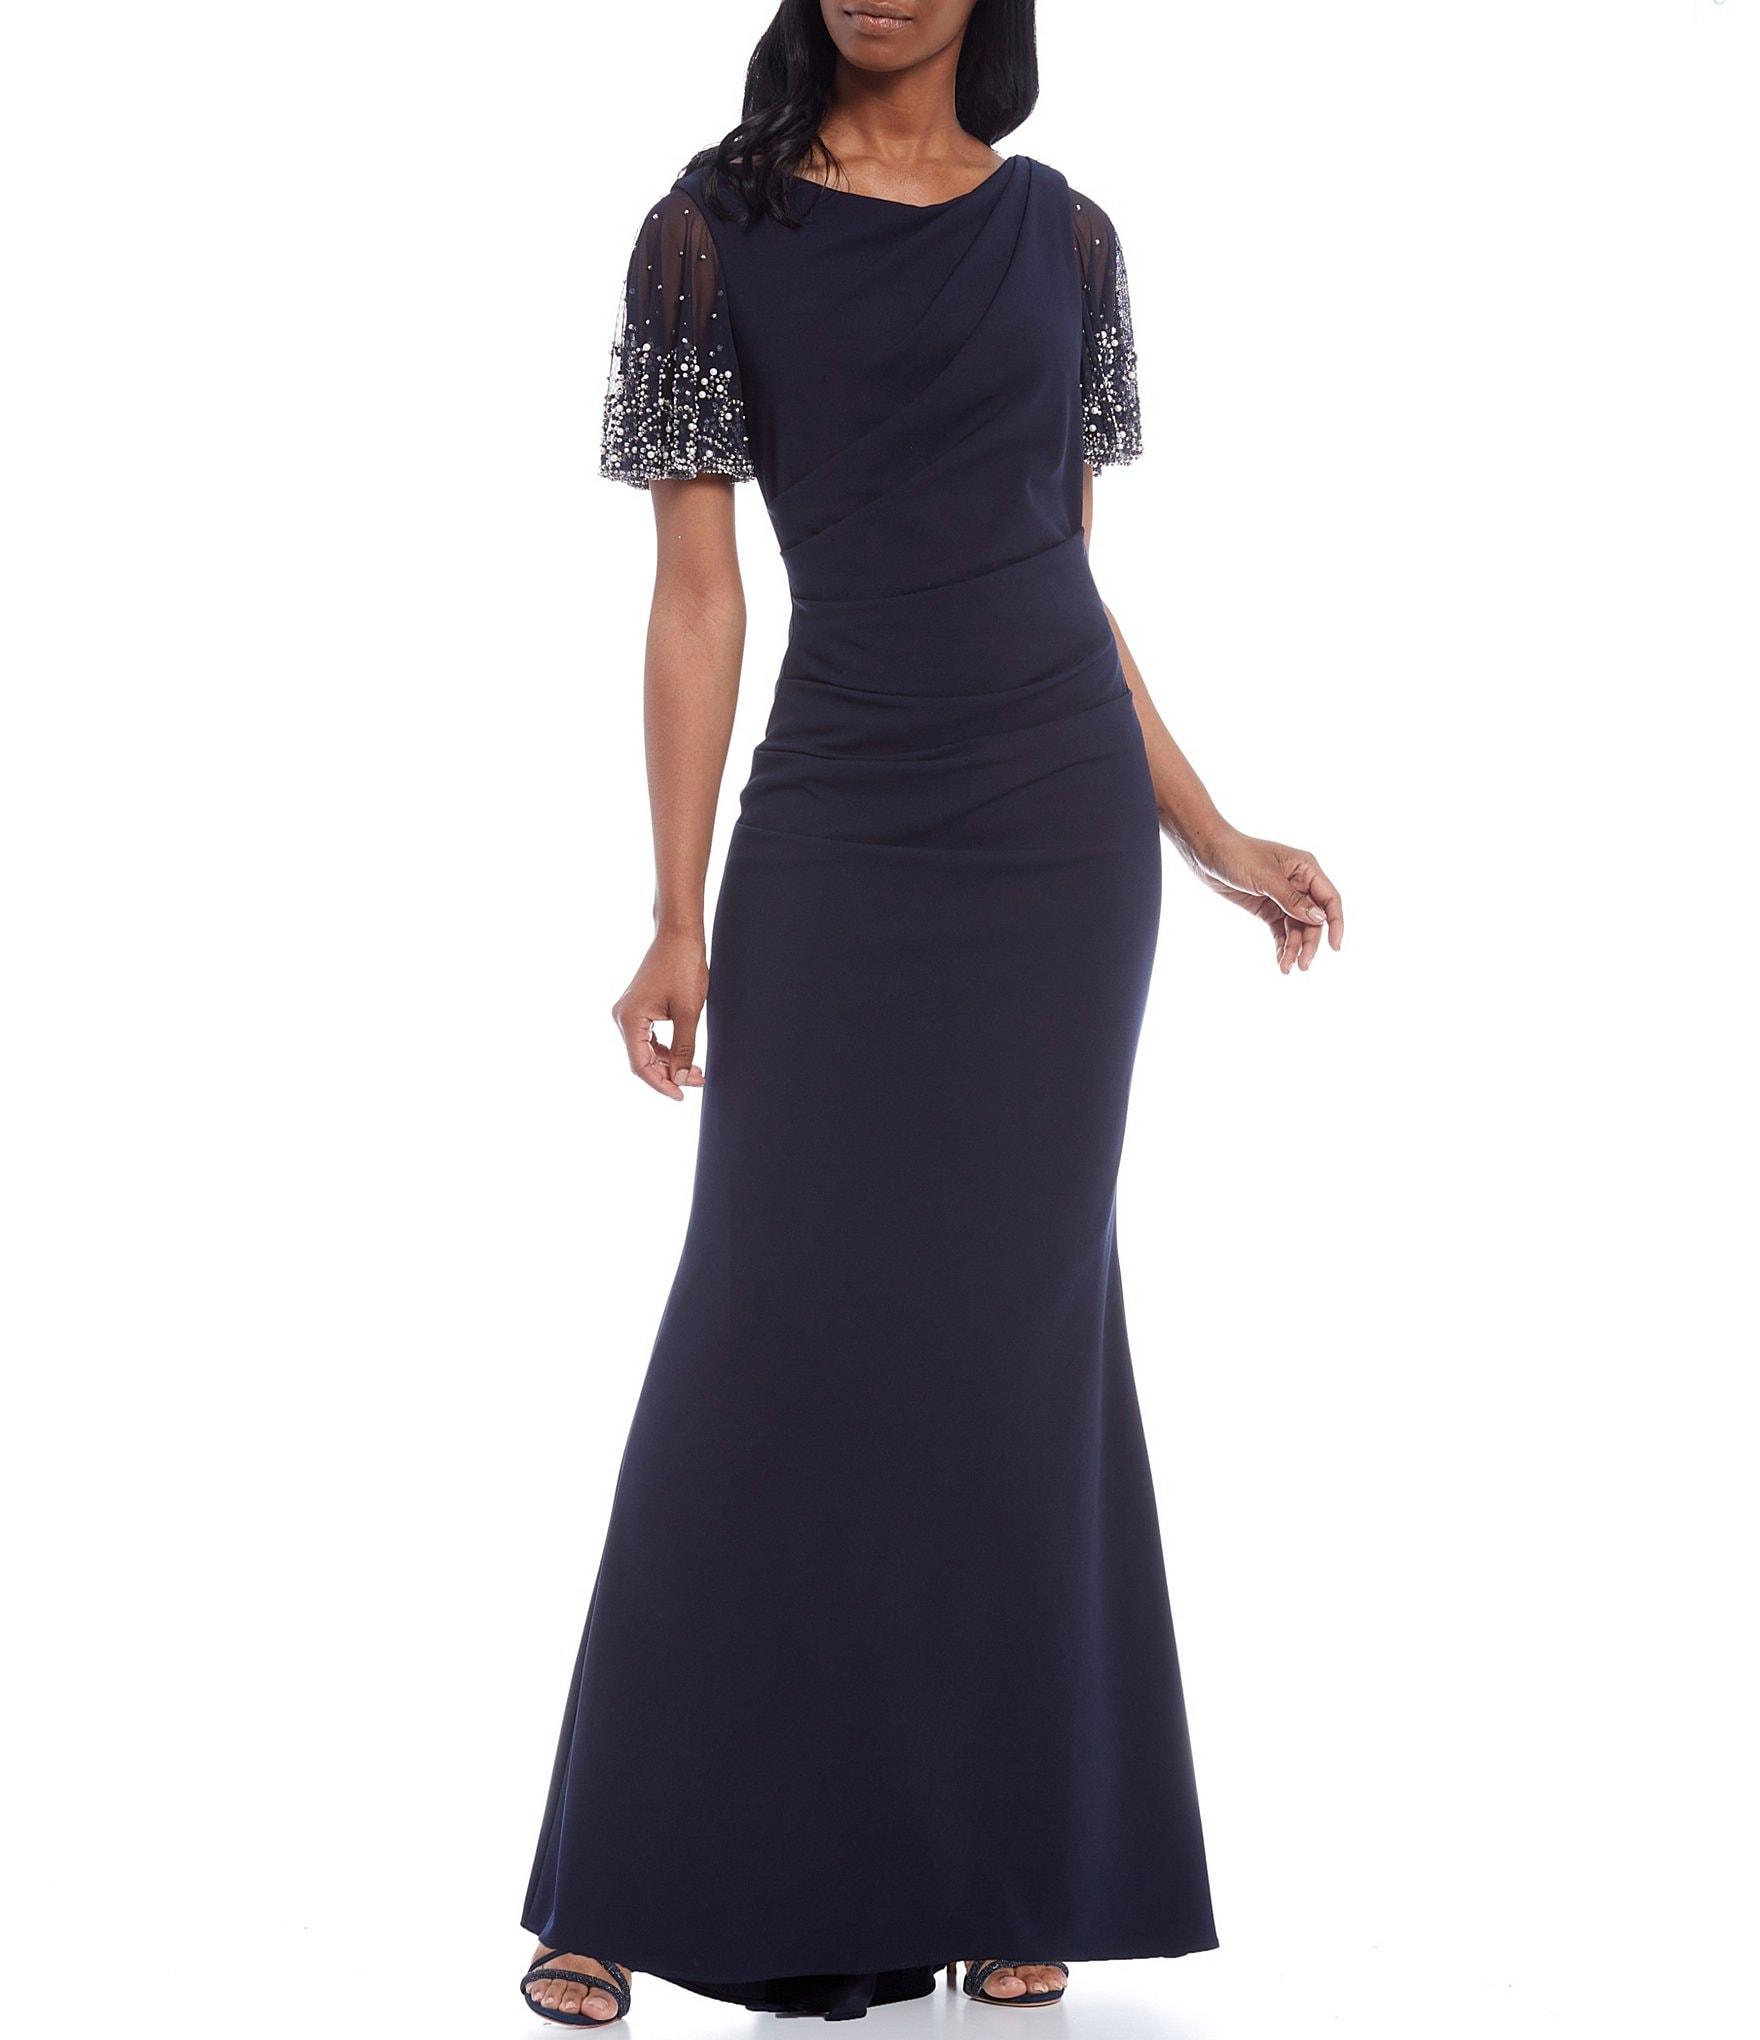 BETSY /& ADAM Women/'s Navy Petite One-shoulder Evening Ball Gown Dress 10P TEDO